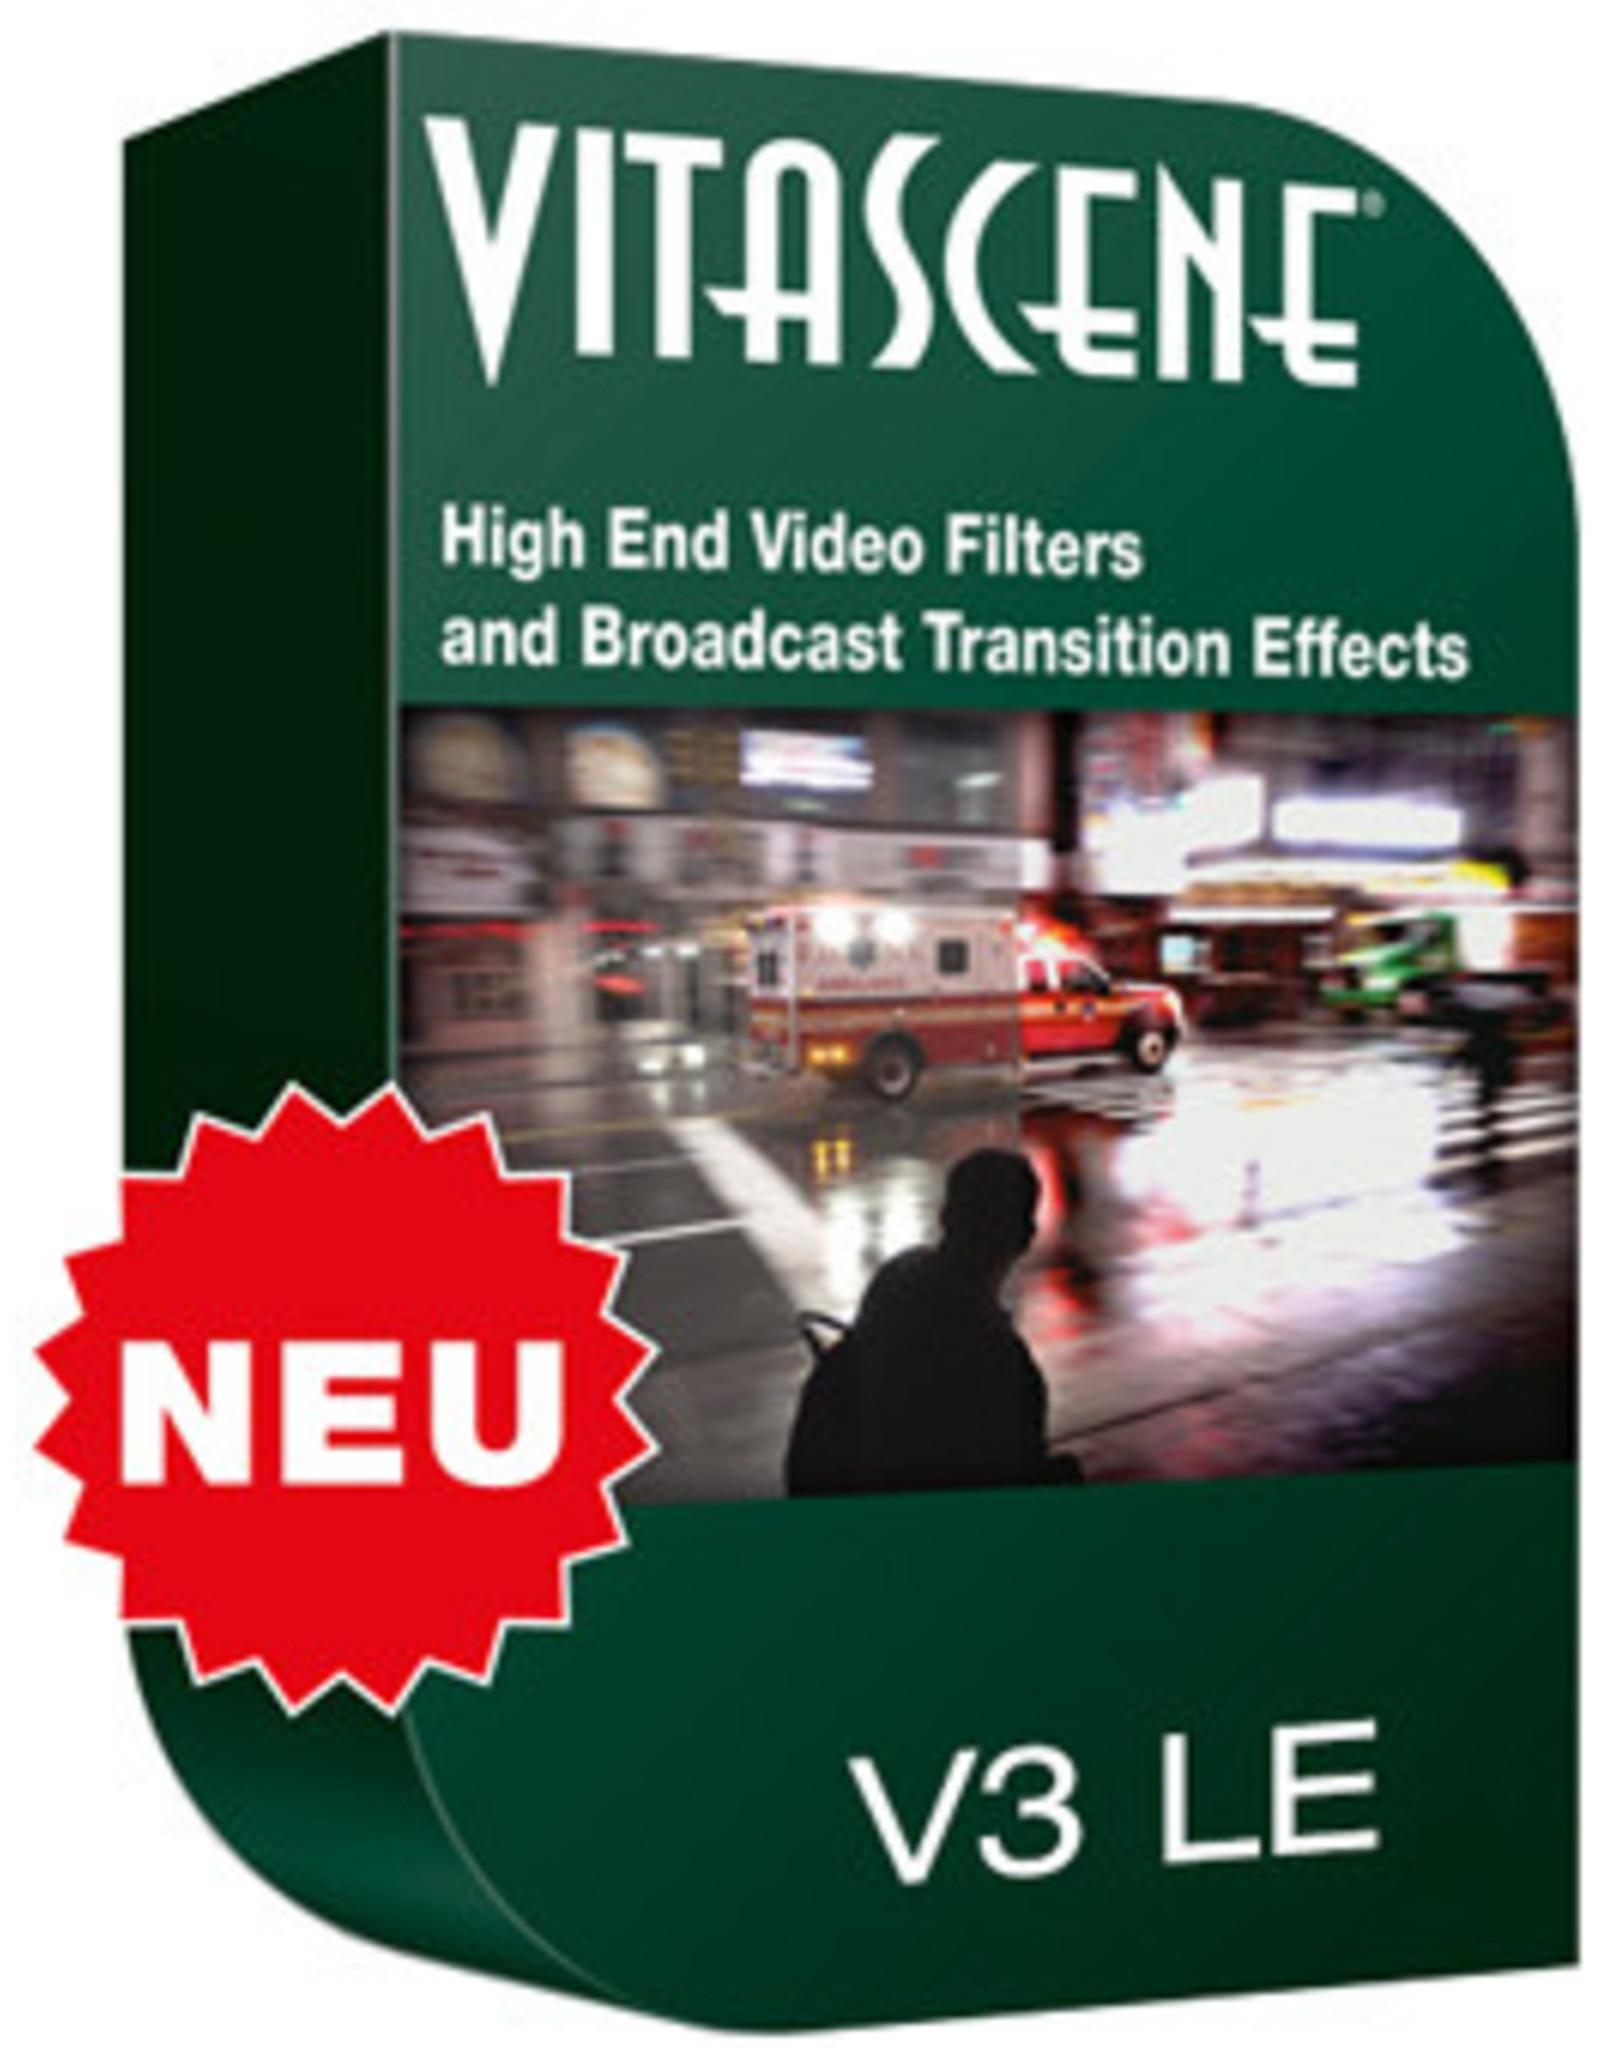 ProDAD ProDAD  Vitascene V3 LE Filter and Transition Plug-in - Promo for EDIUS 9 customers